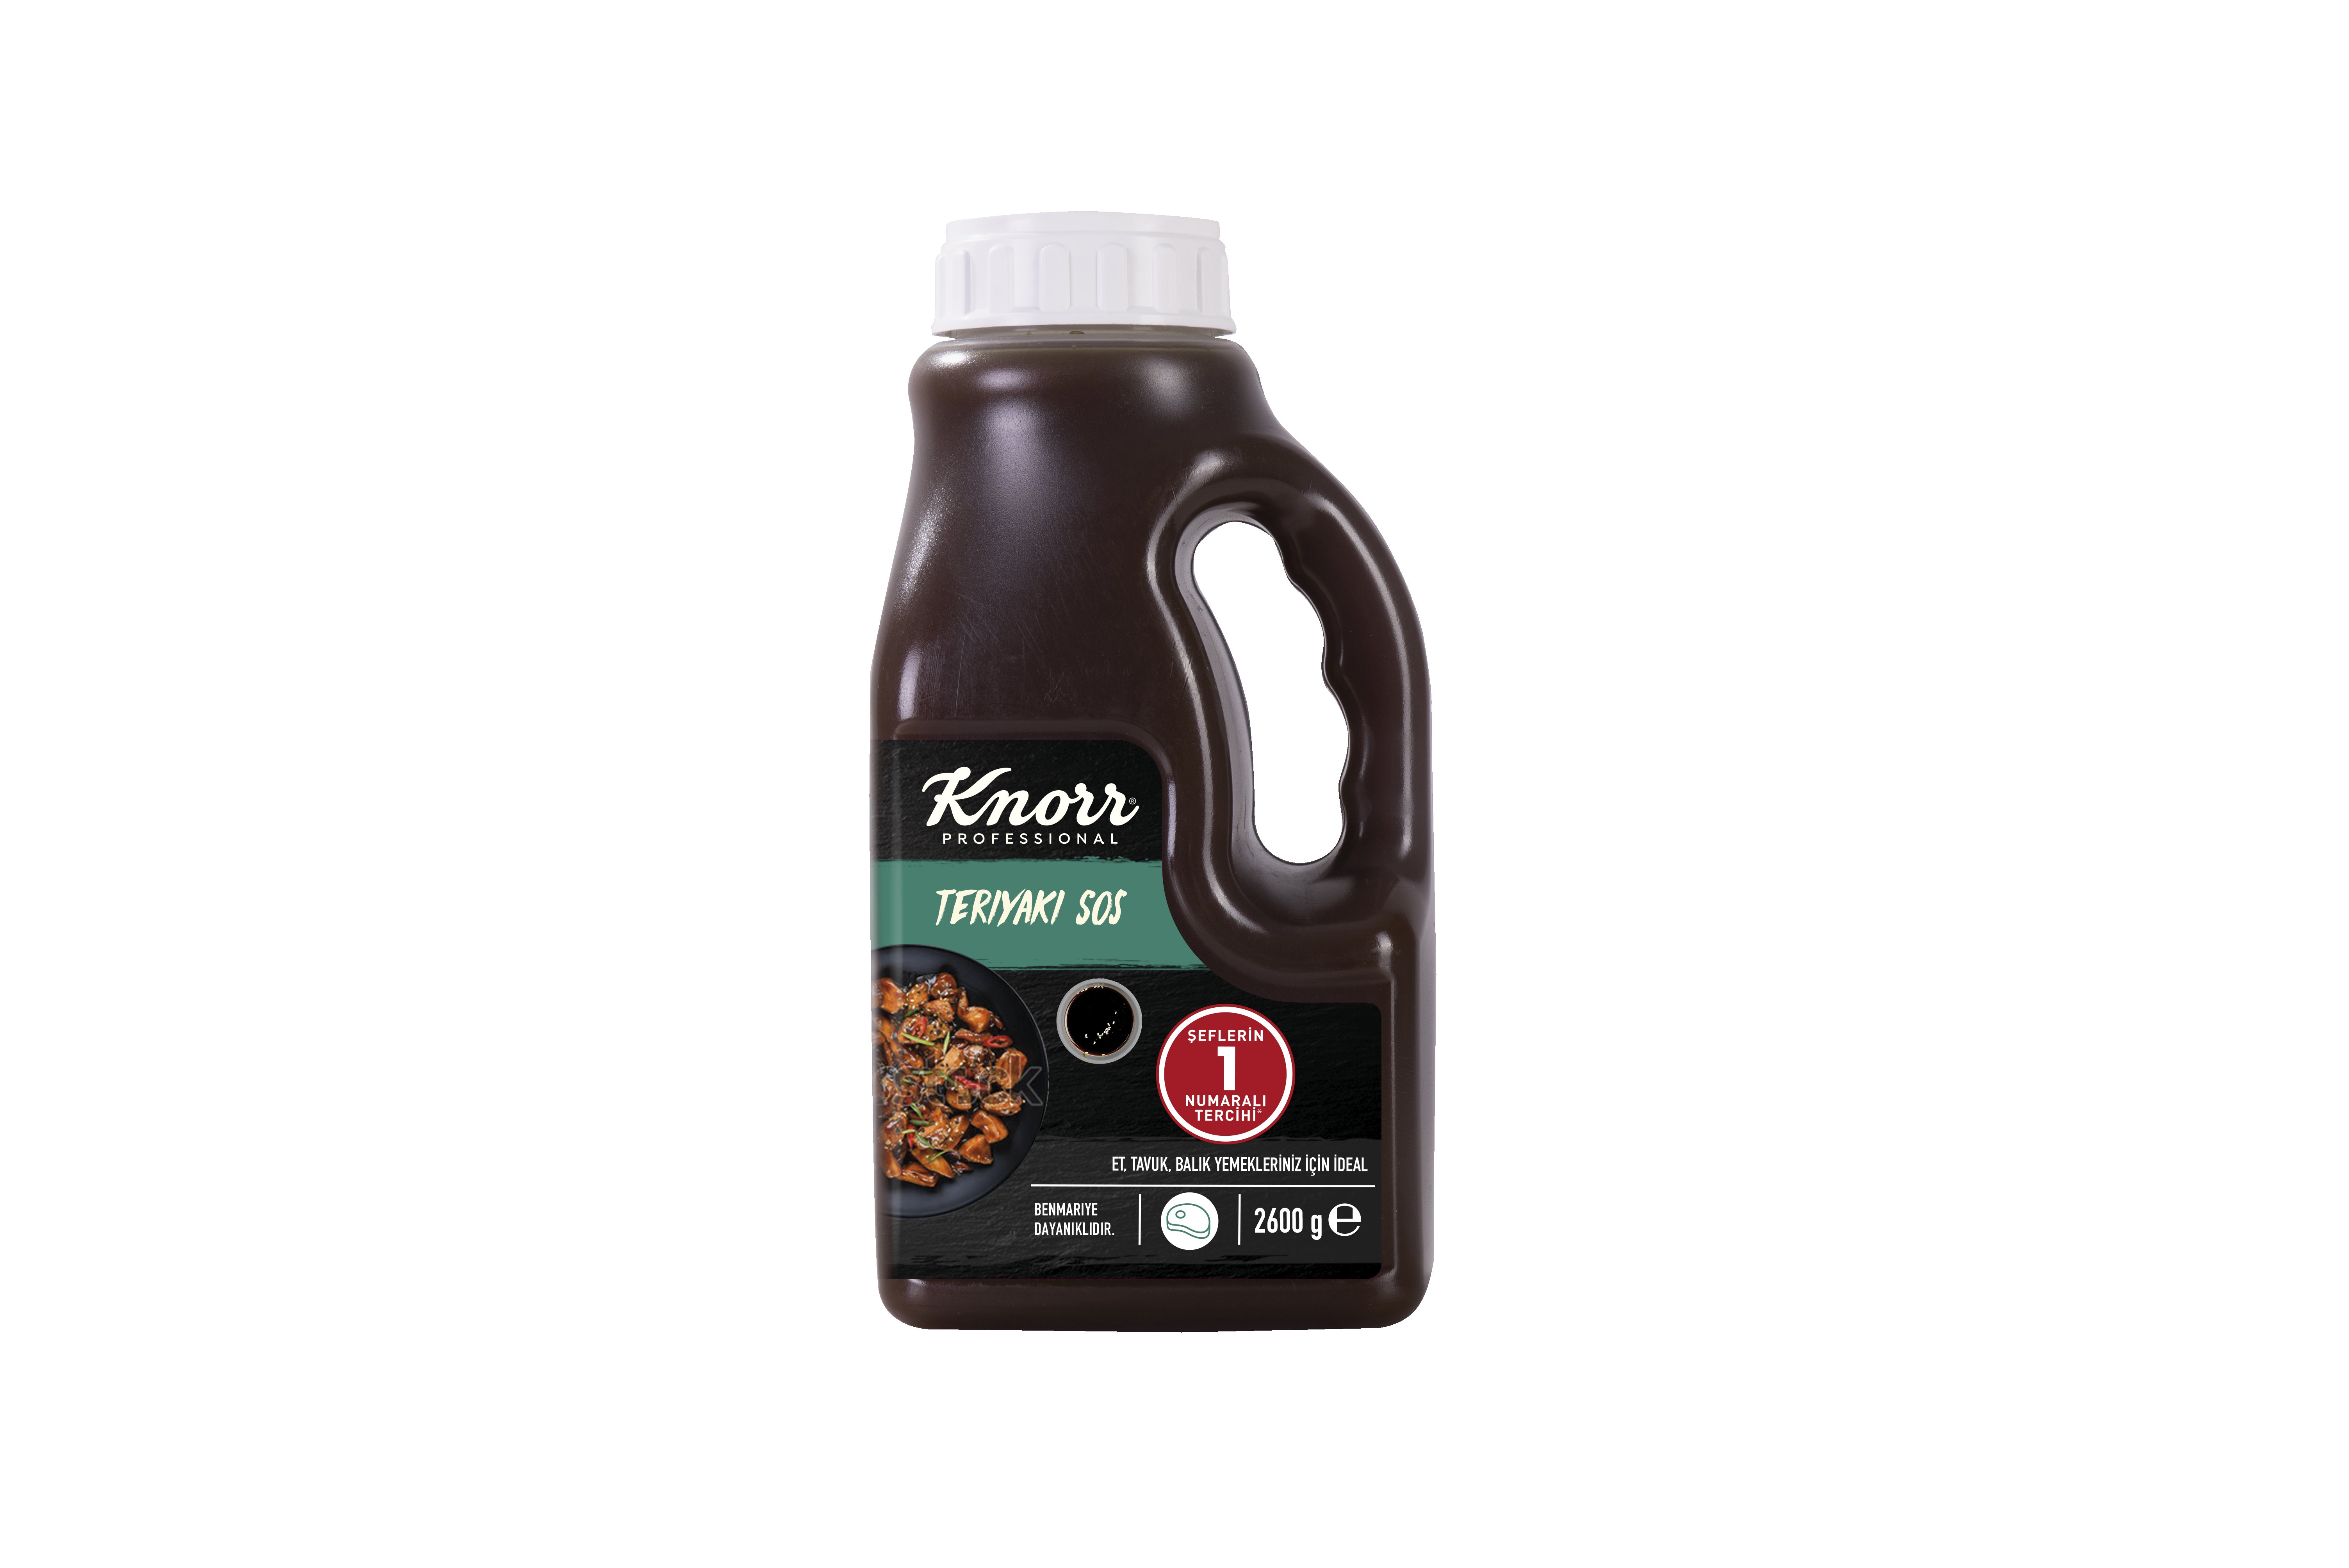 Knorr Teriyaki Sos 2.6 L